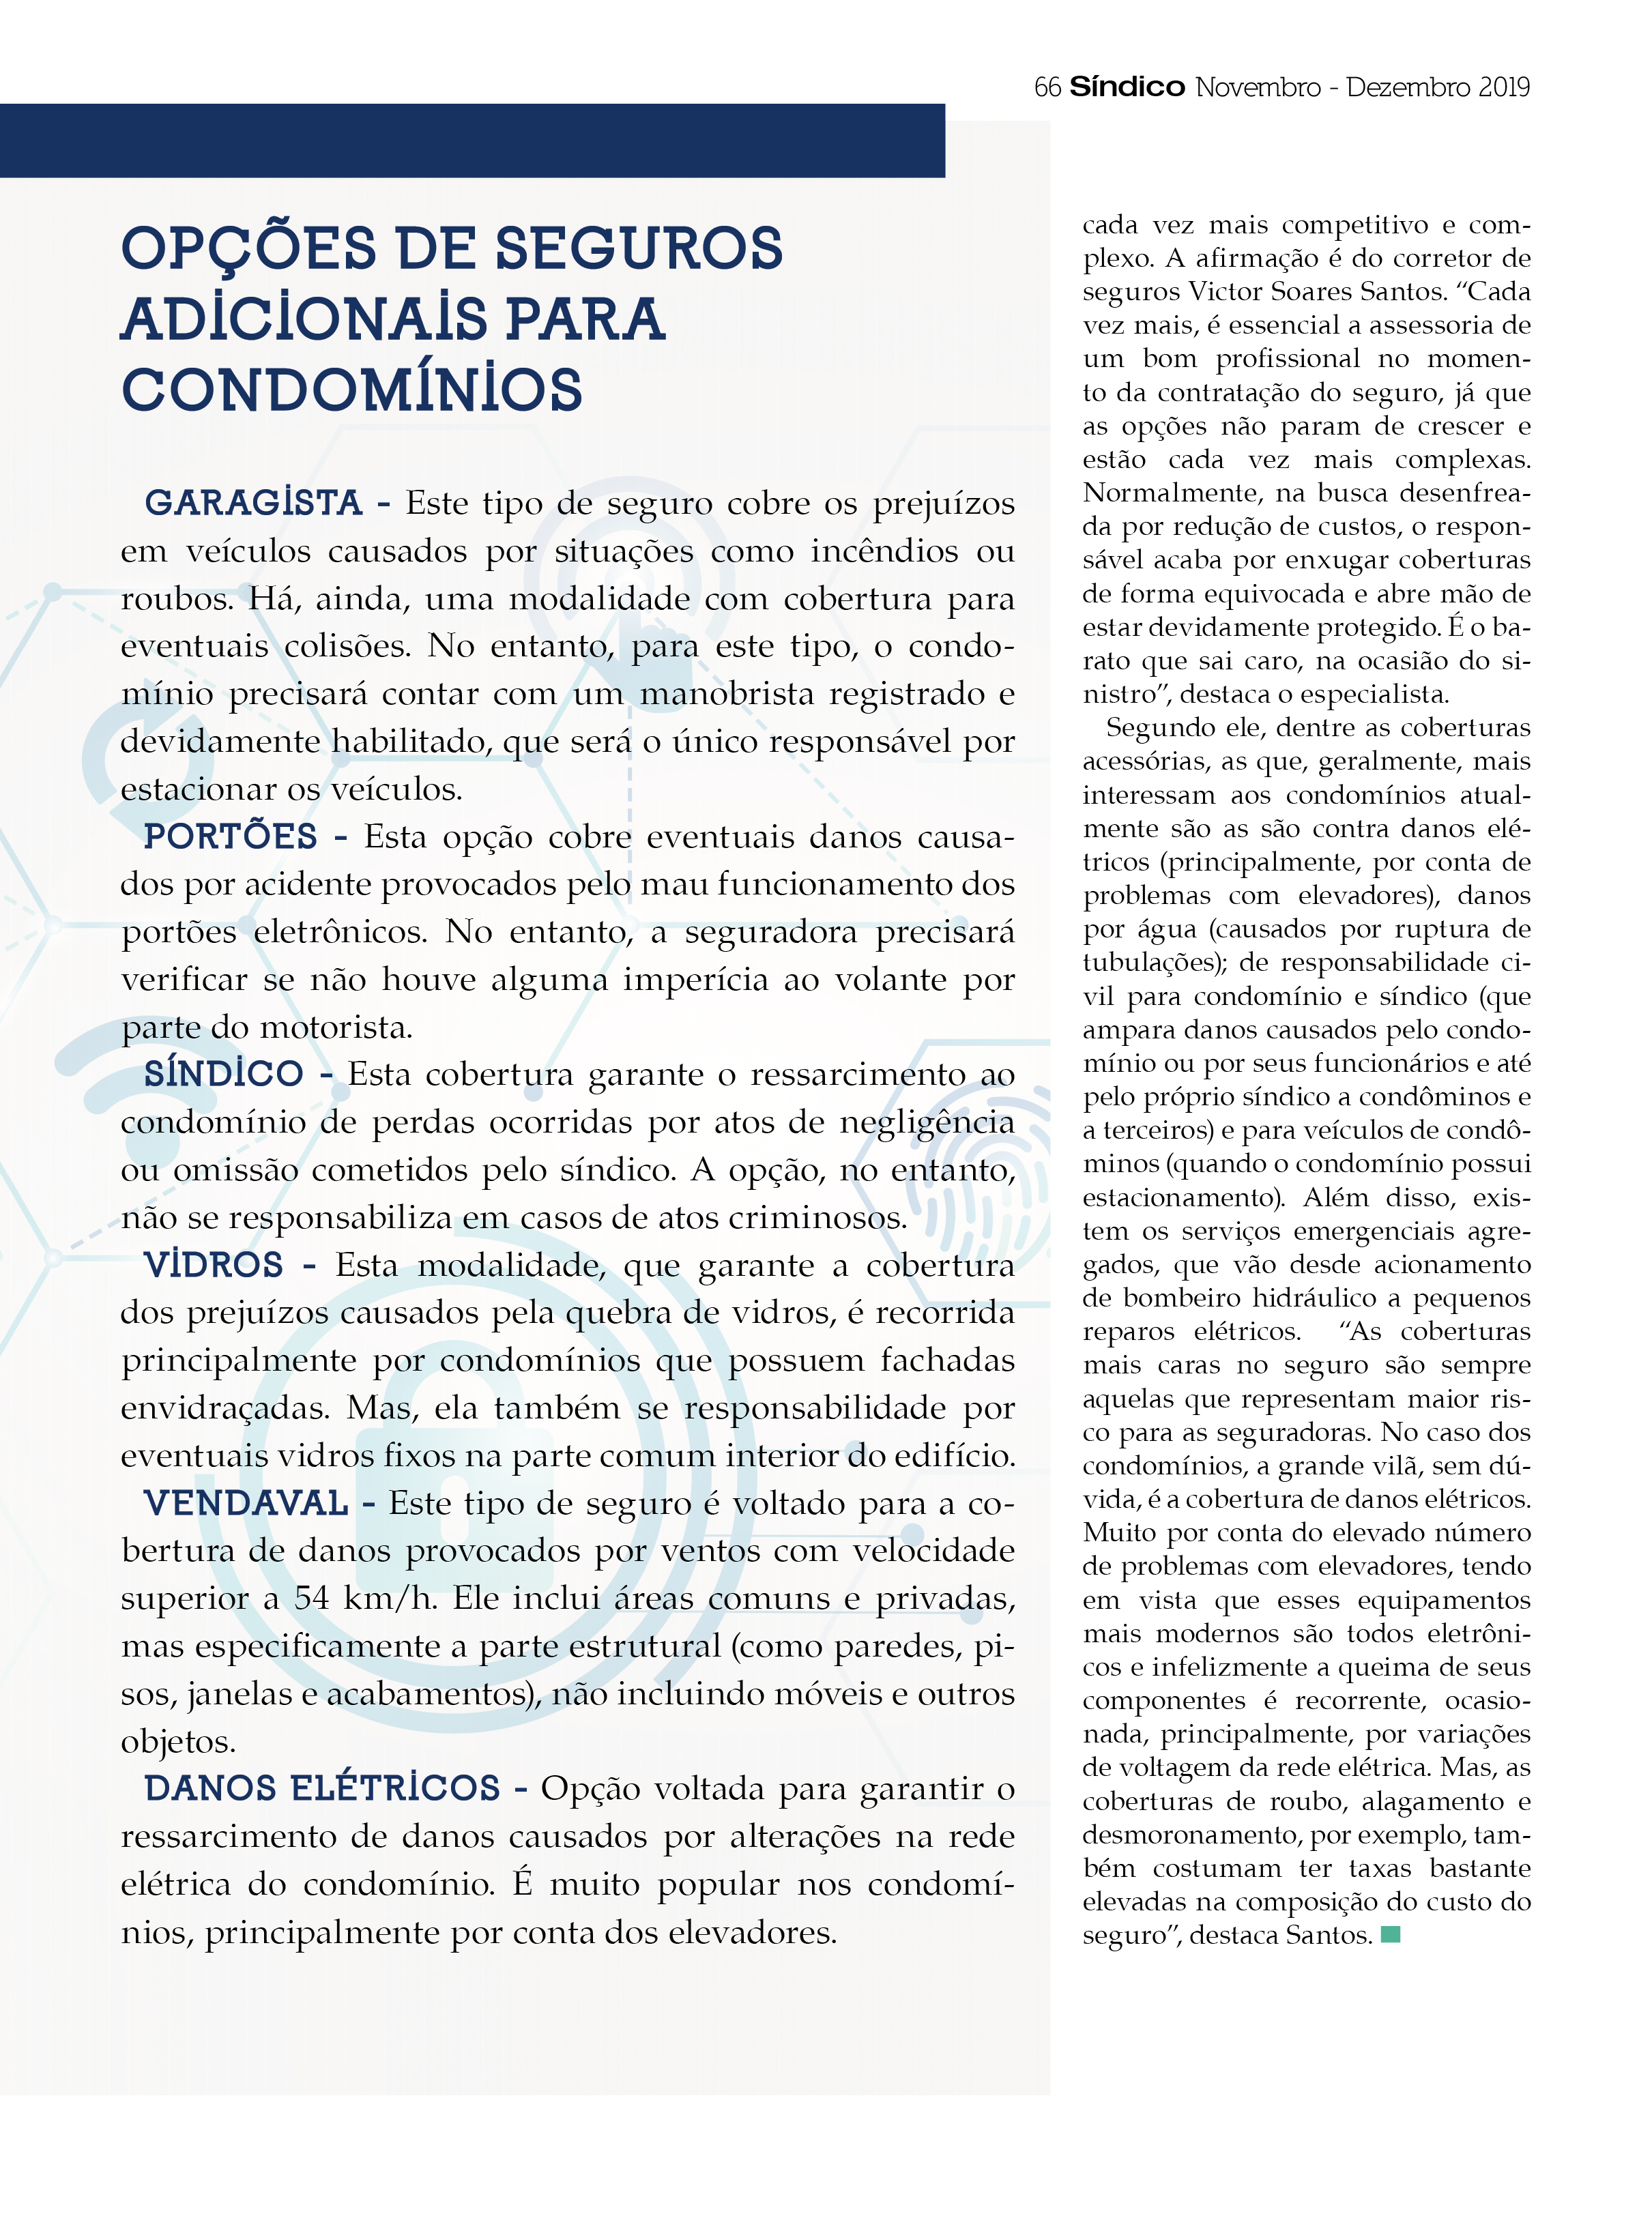 Revista Síndico_ed 247_64